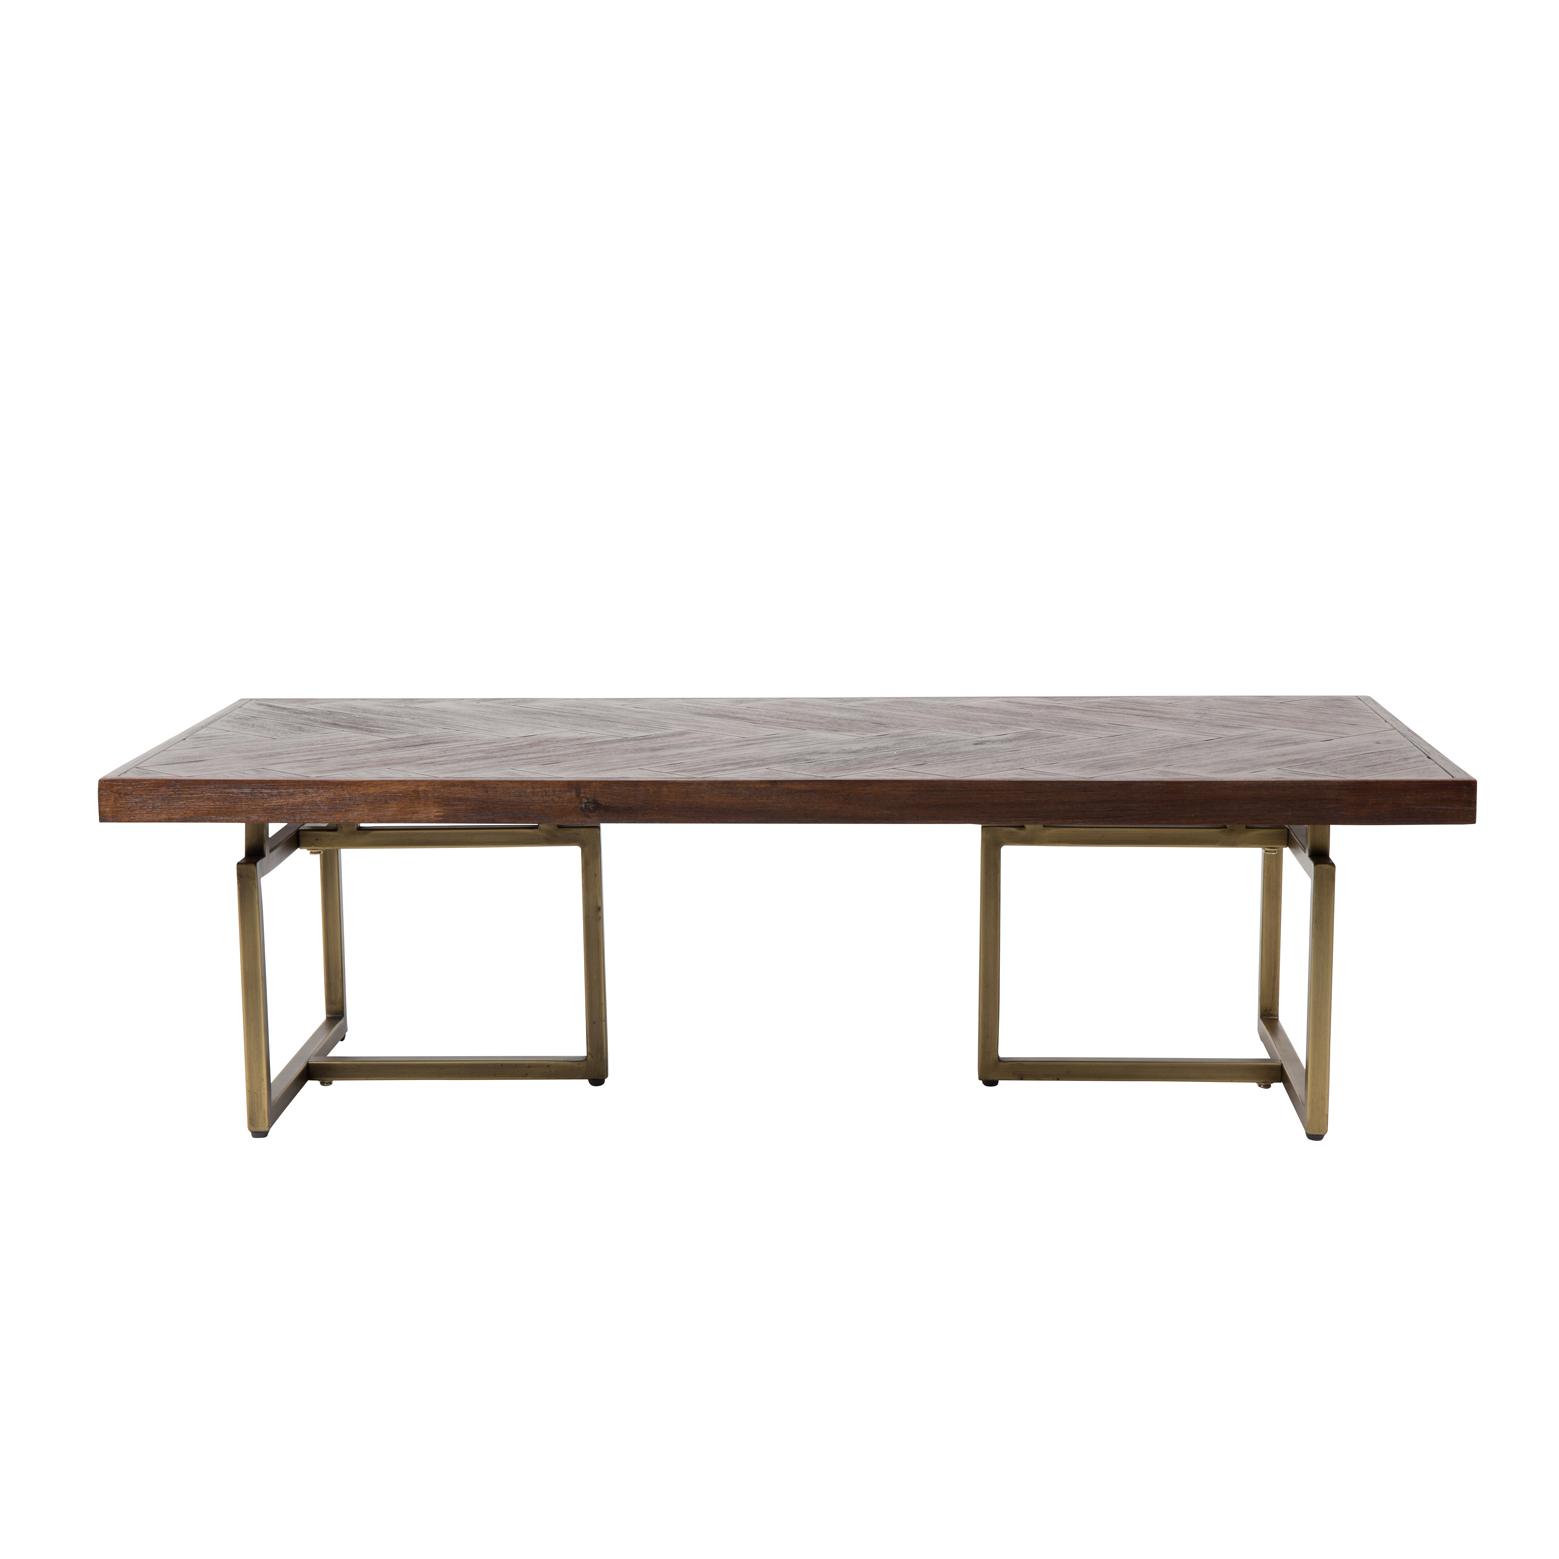 Shop_Herringbon wooden sofa table.jpg